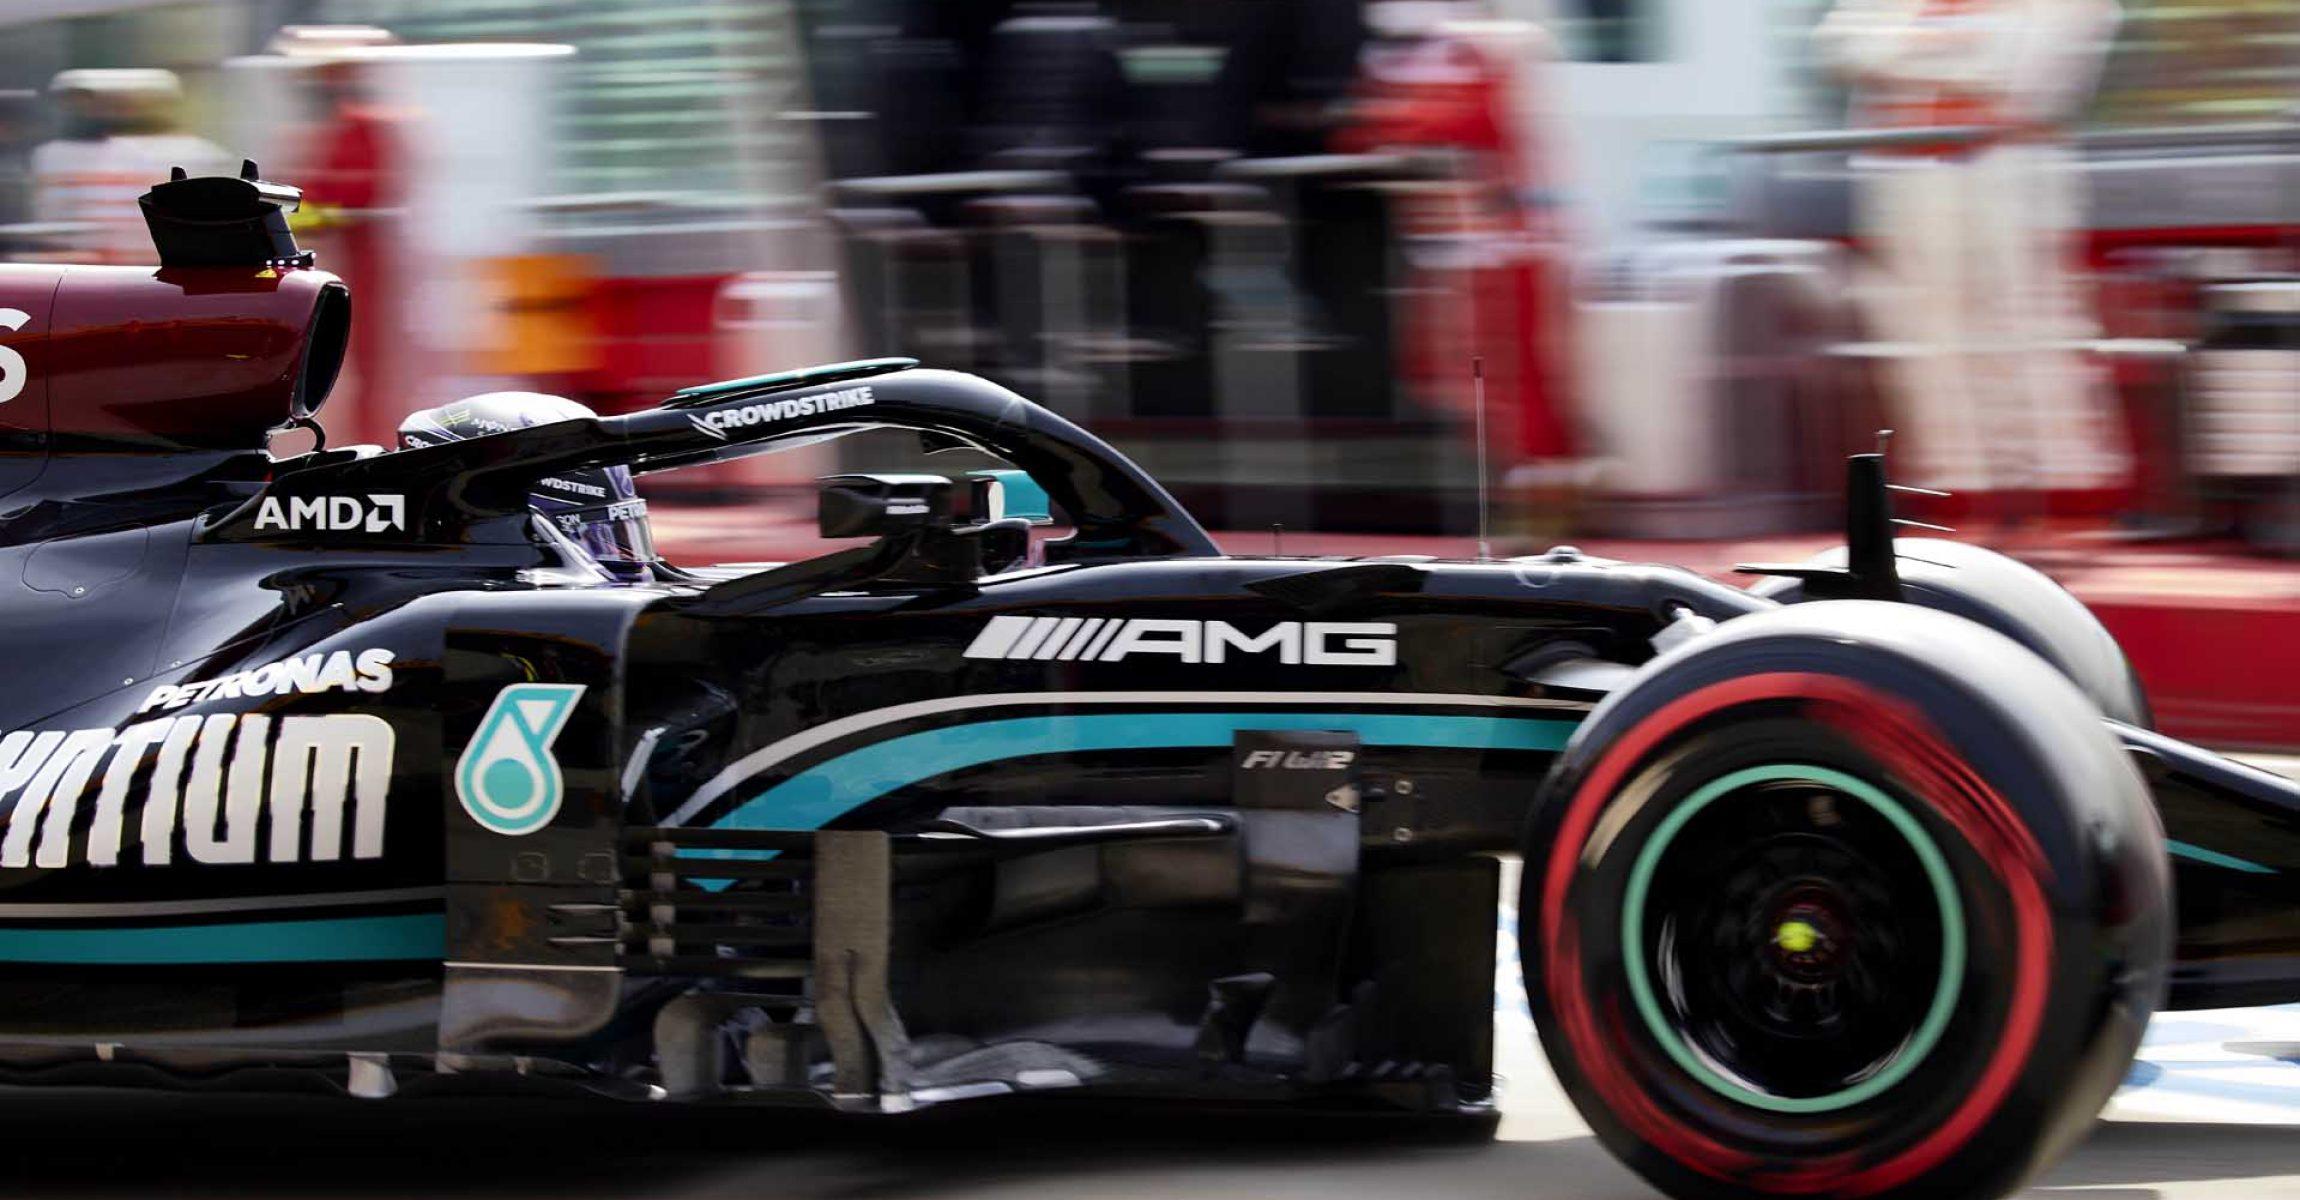 2021 Emilia Romagna Grand Prix, Saturday - Steve Etherington Lewis Hamilton Mercedes